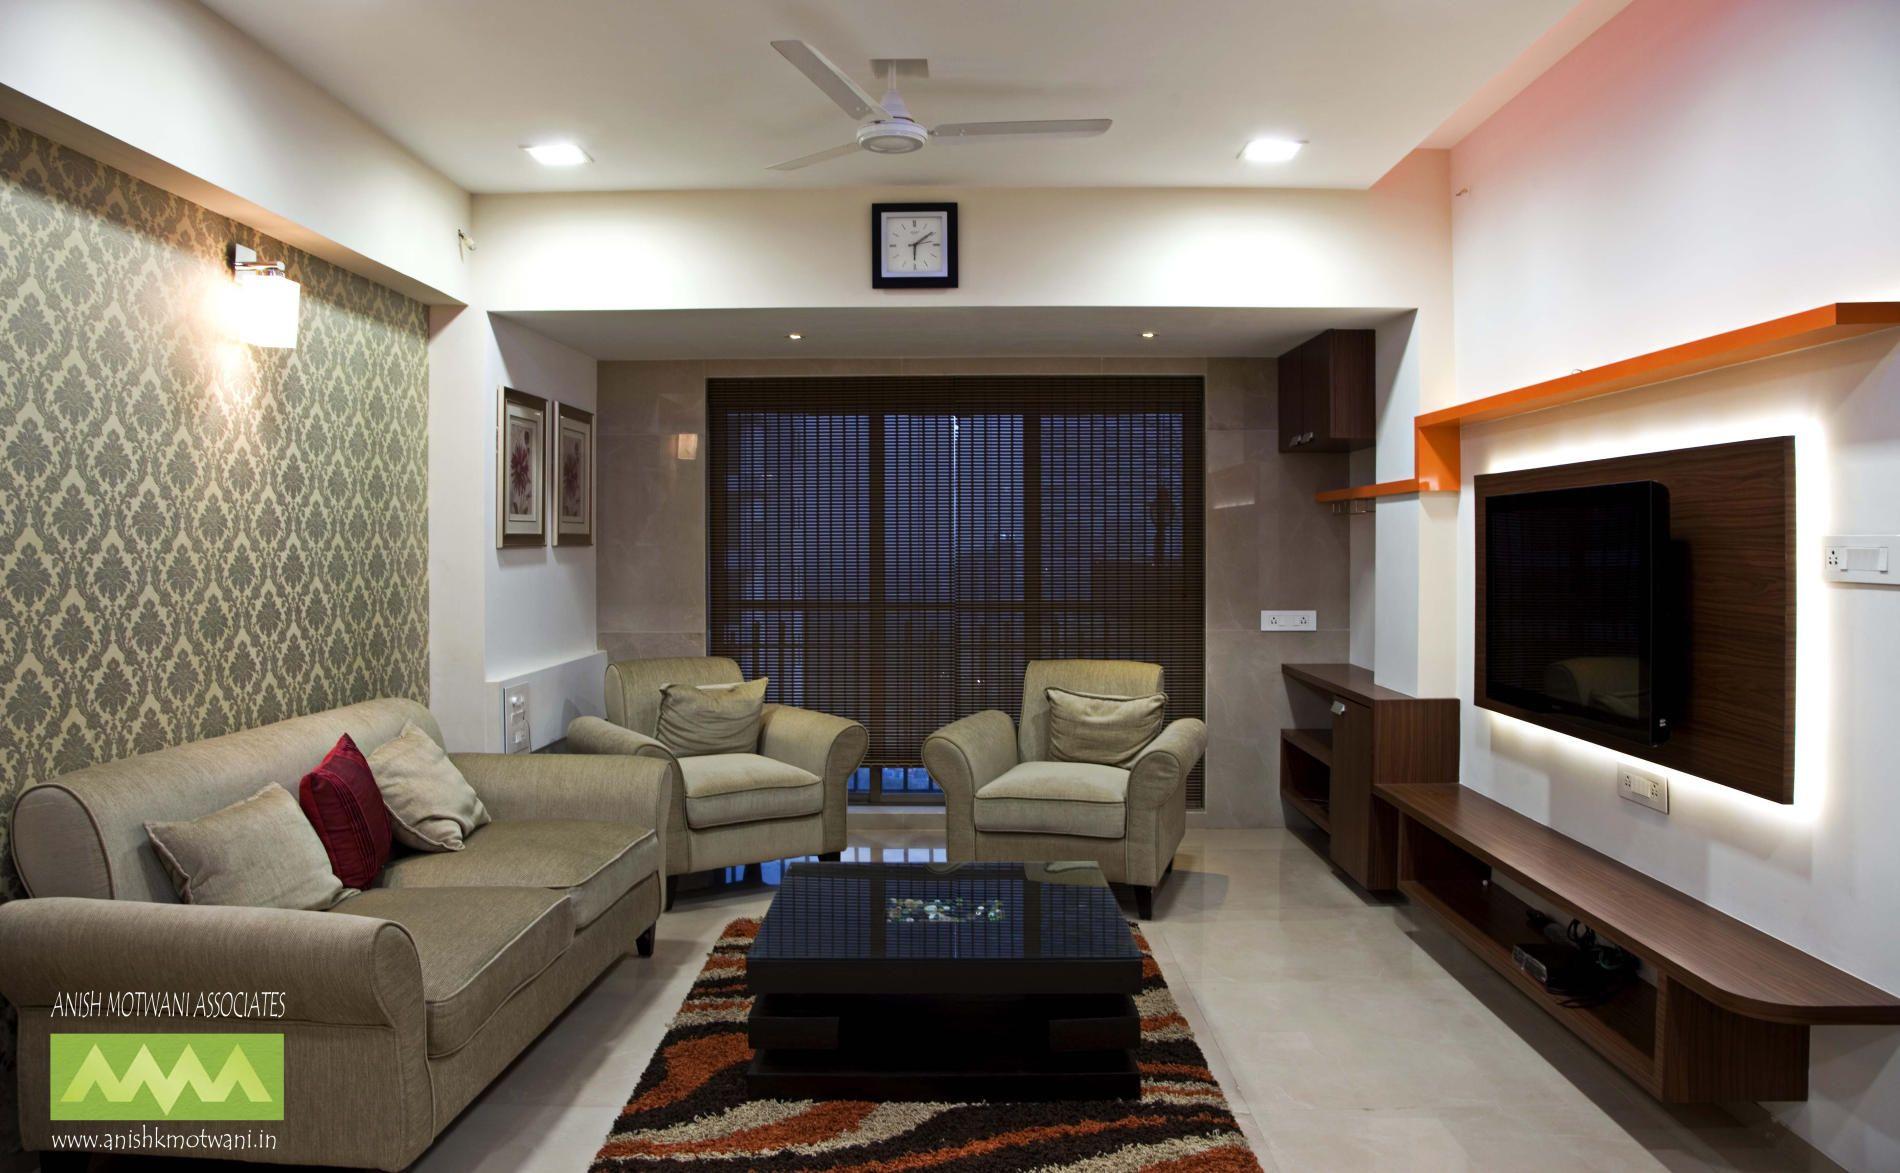 Indian home interior design ideas for living room also house designs rh pinterest